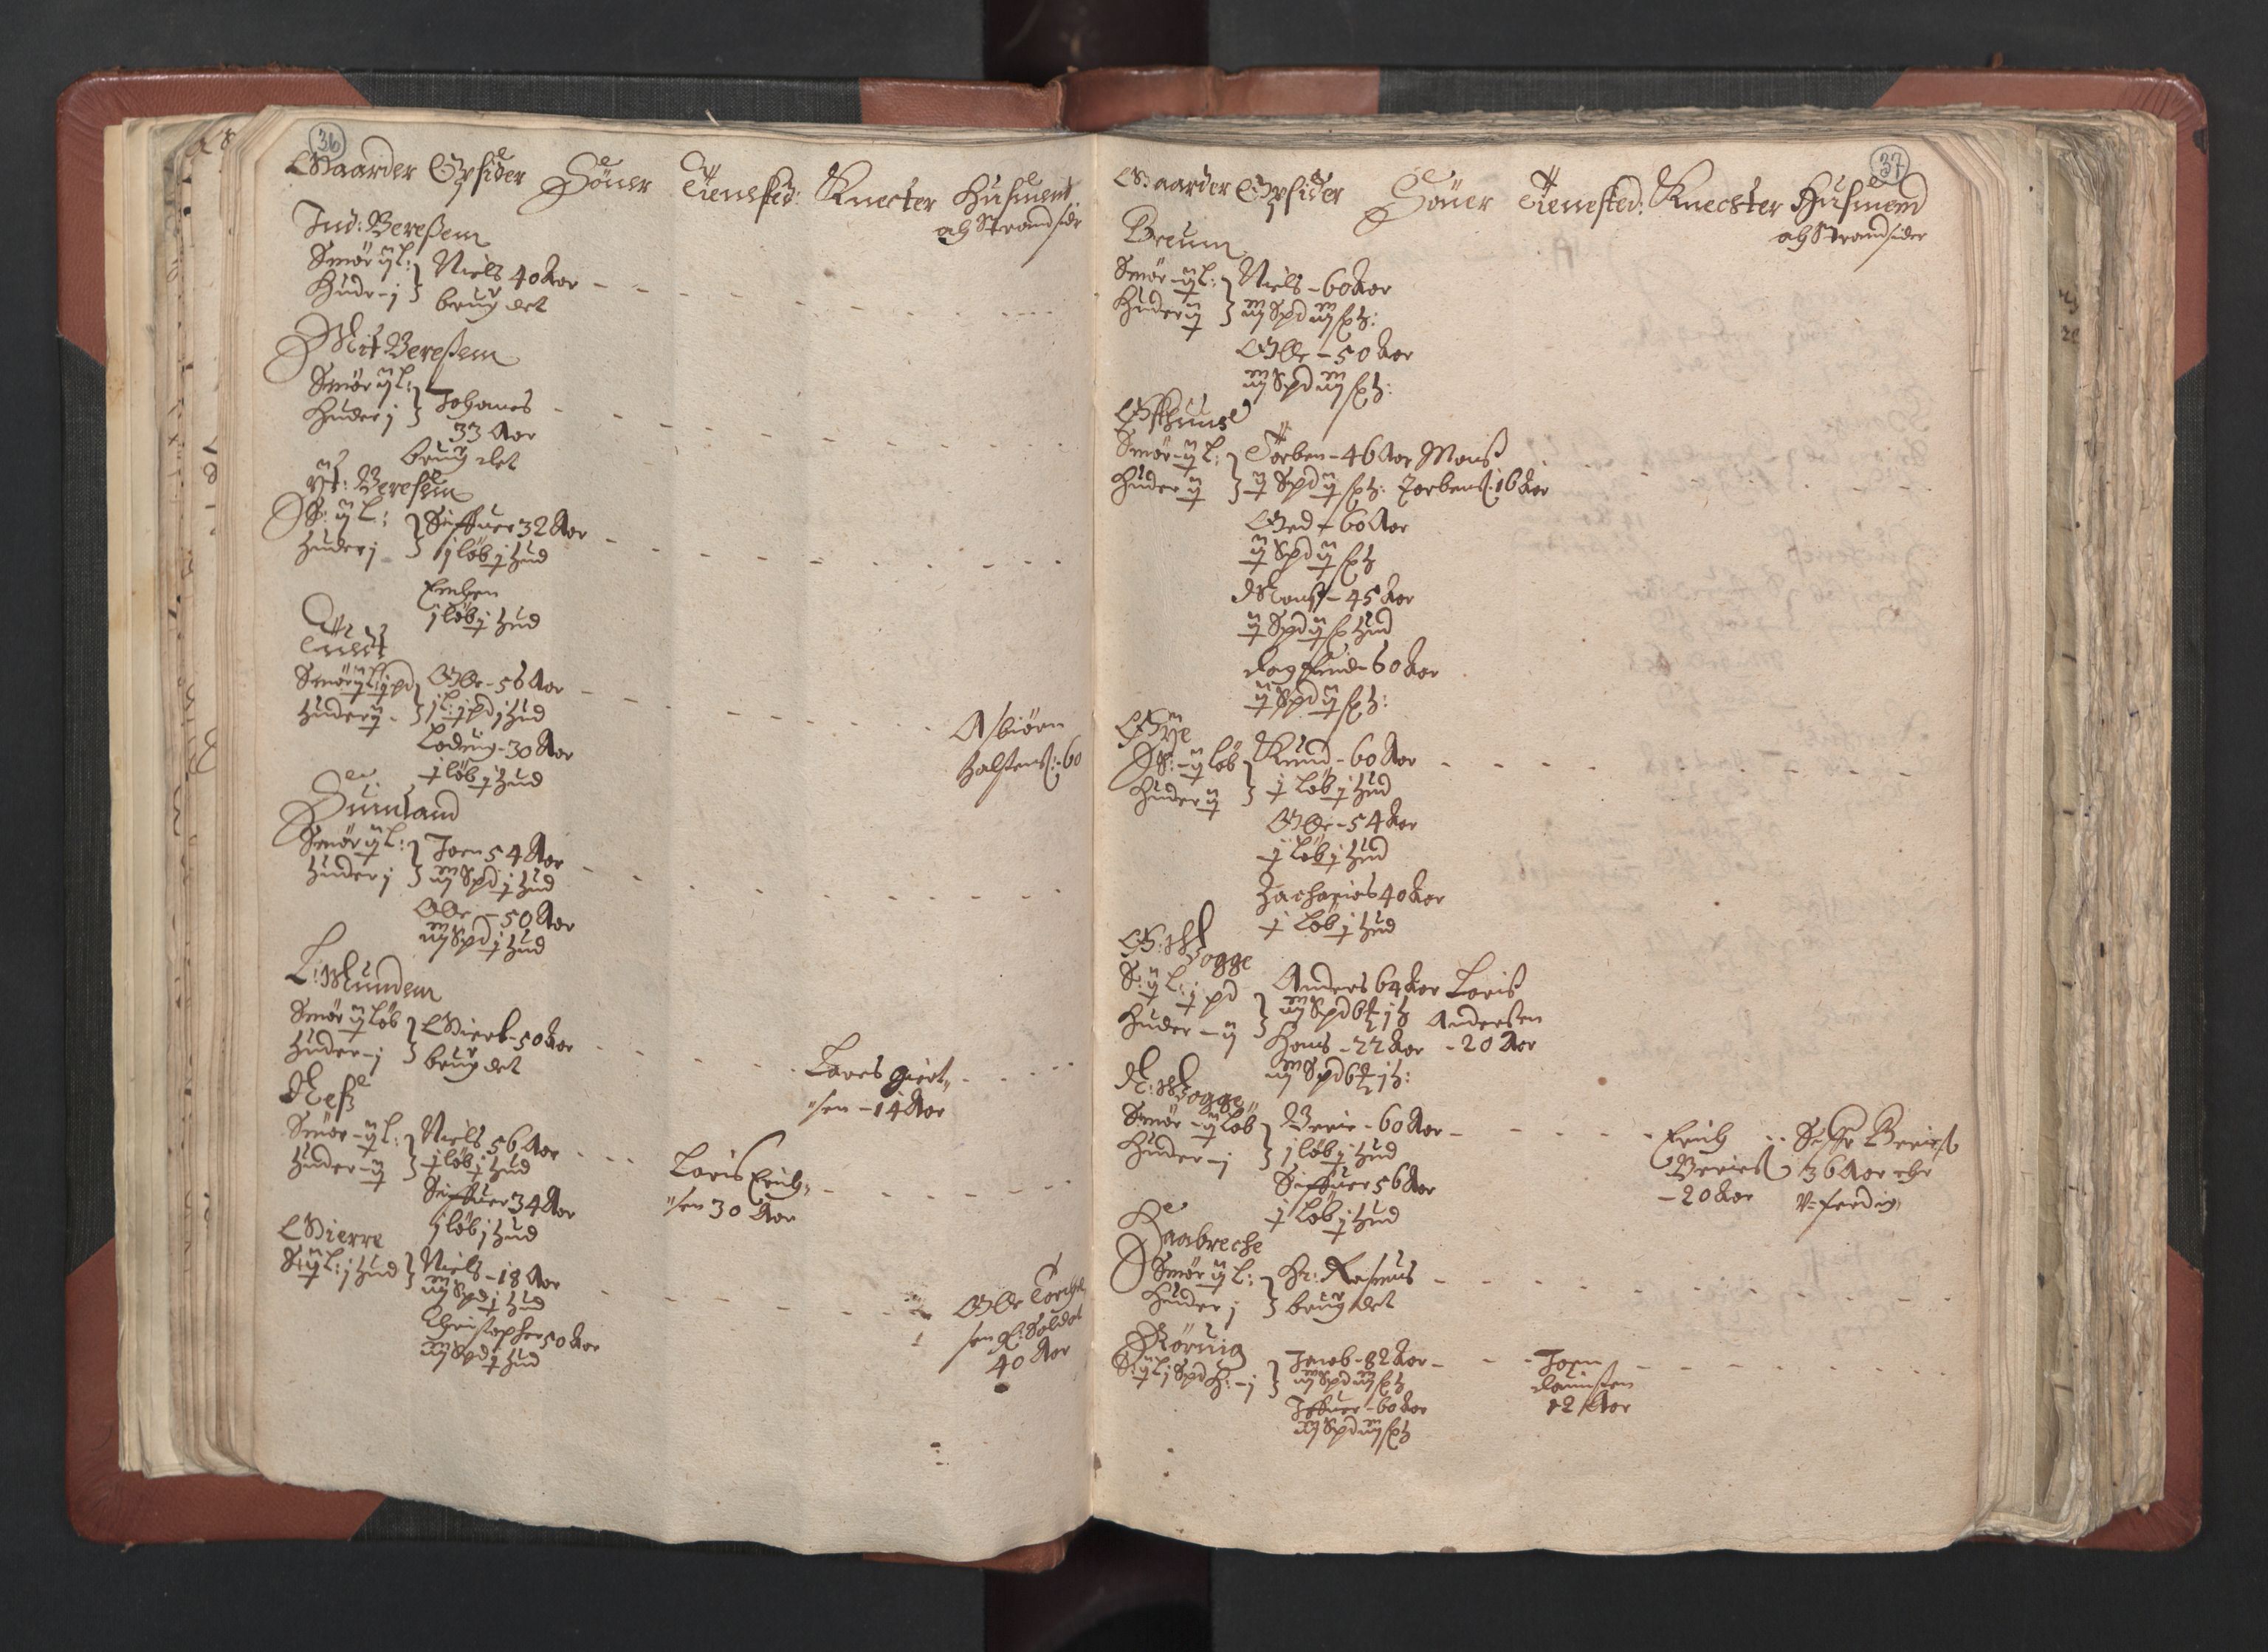 RA, Bailiff's Census 1664-1666, no. 13: Nordhordland fogderi and Sunnhordland fogderi, 1665, p. 36-37